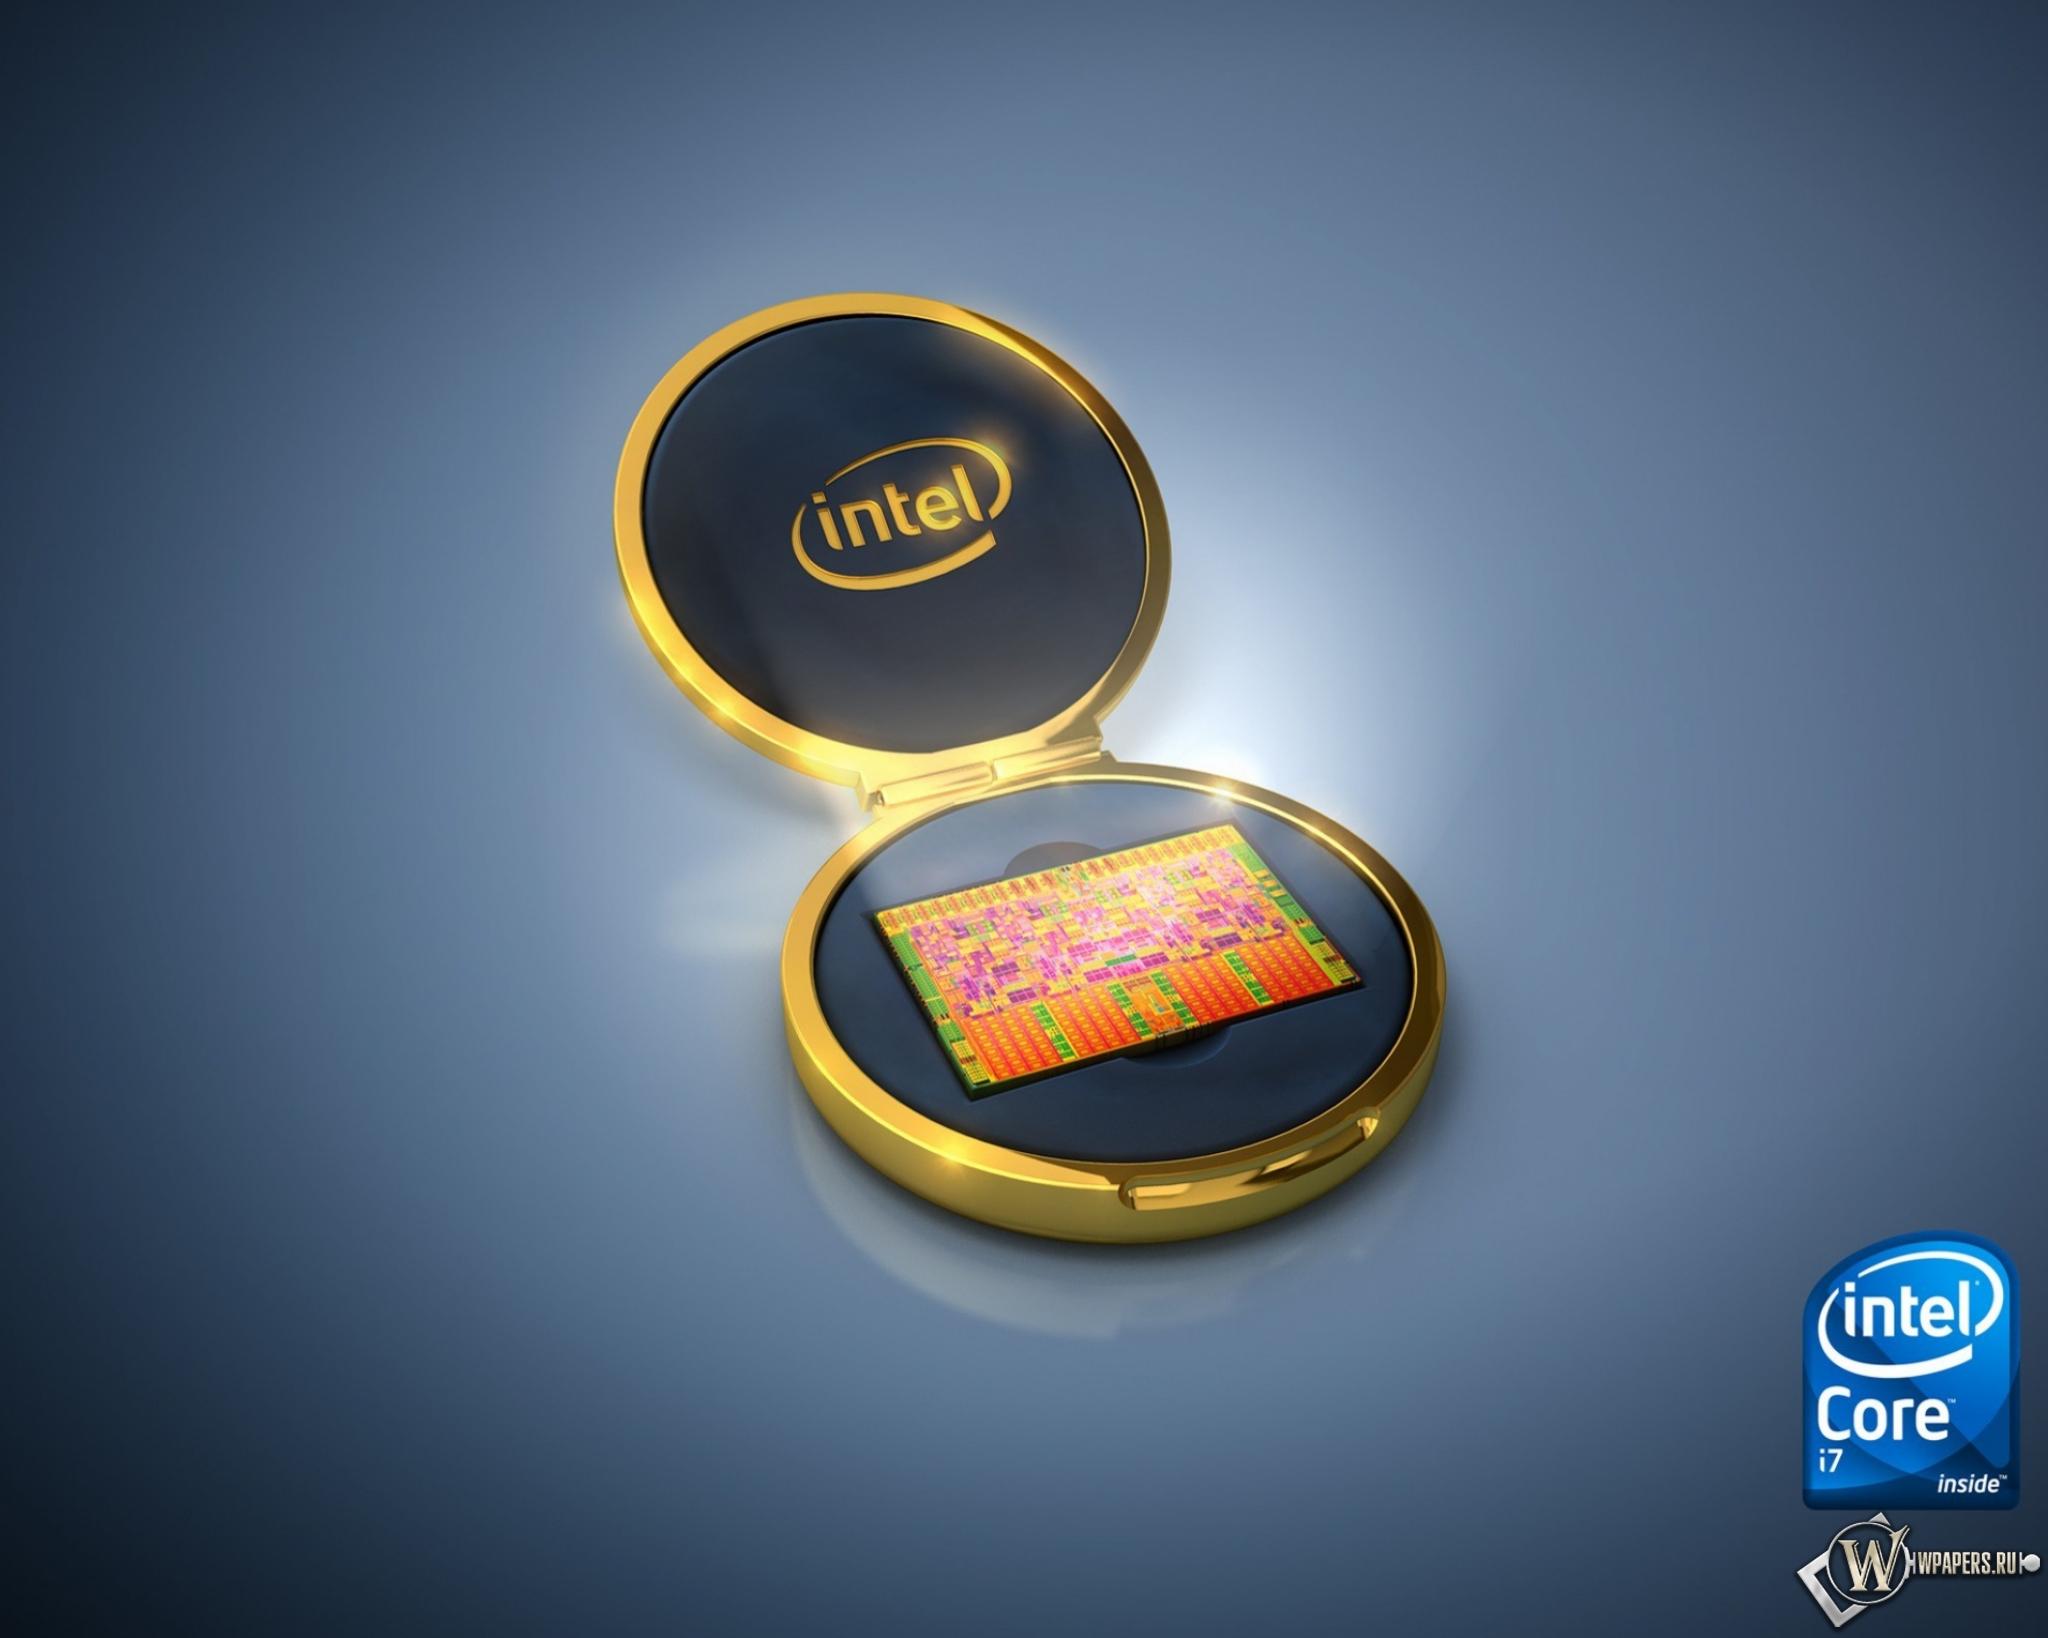 Intel Core i76700HQ Processor 6M Cache up to 350 GHz